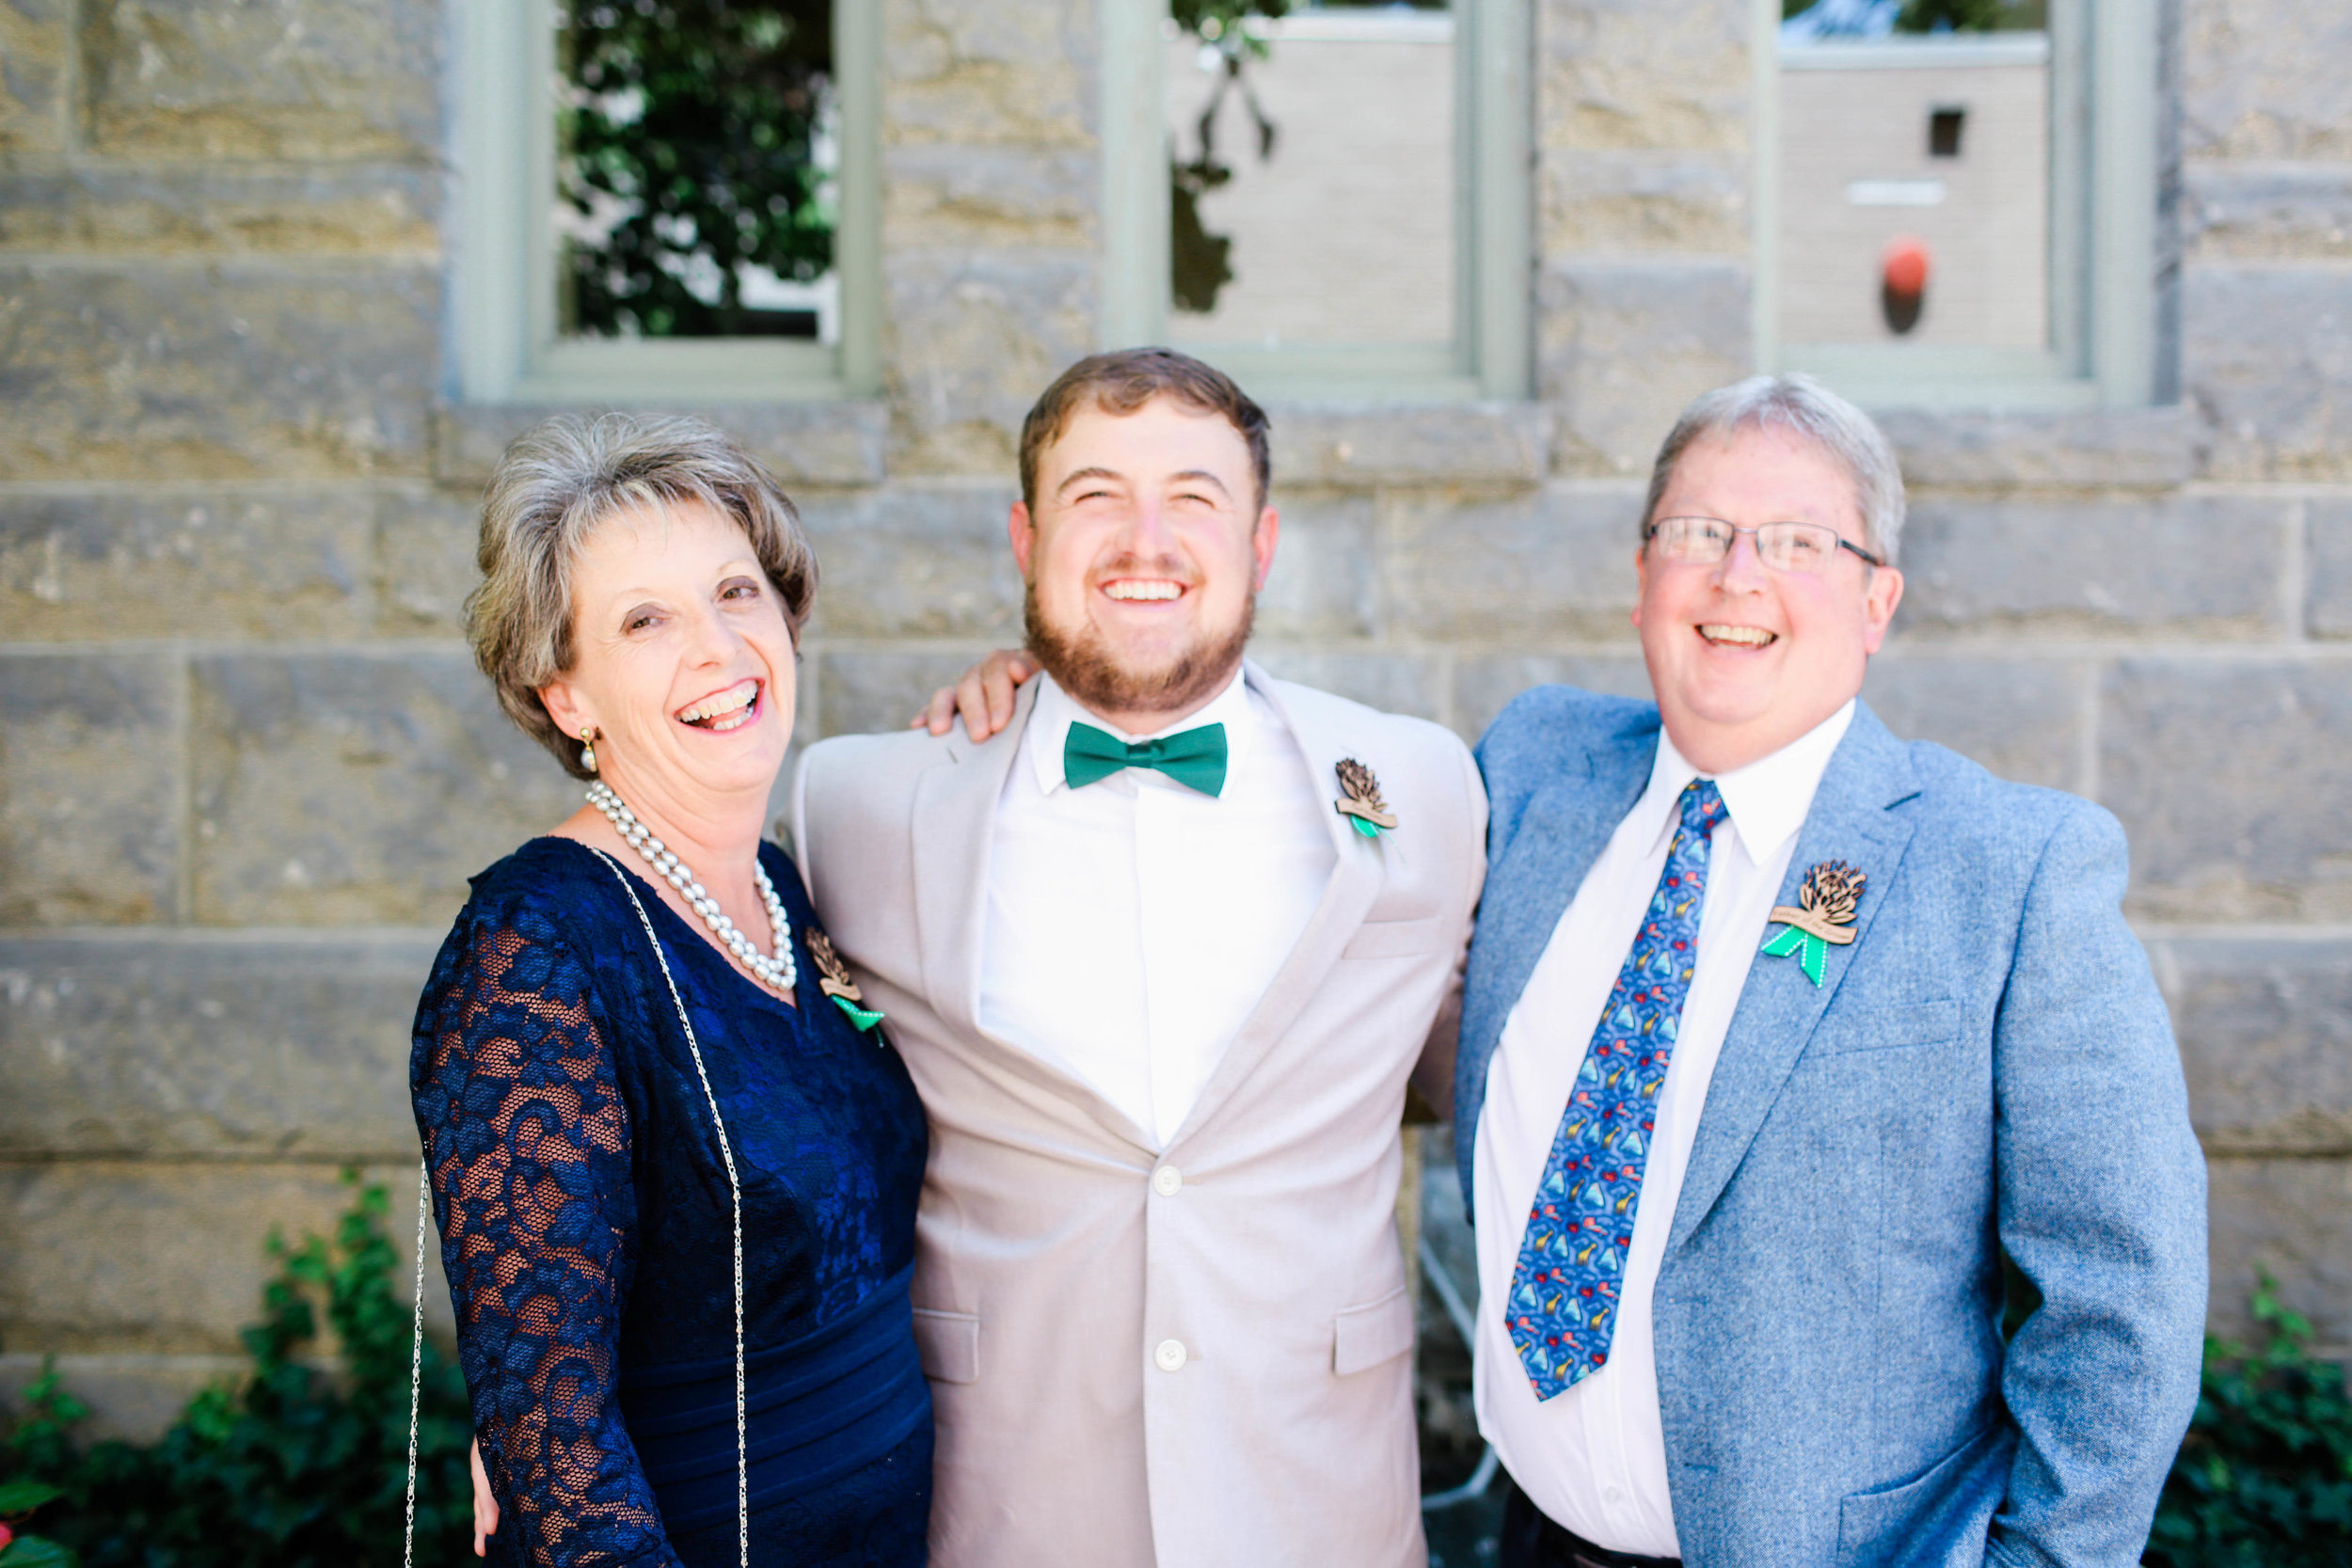 A-Lydia-Rohan-Downtown-Boise-Wedding-39.jpg